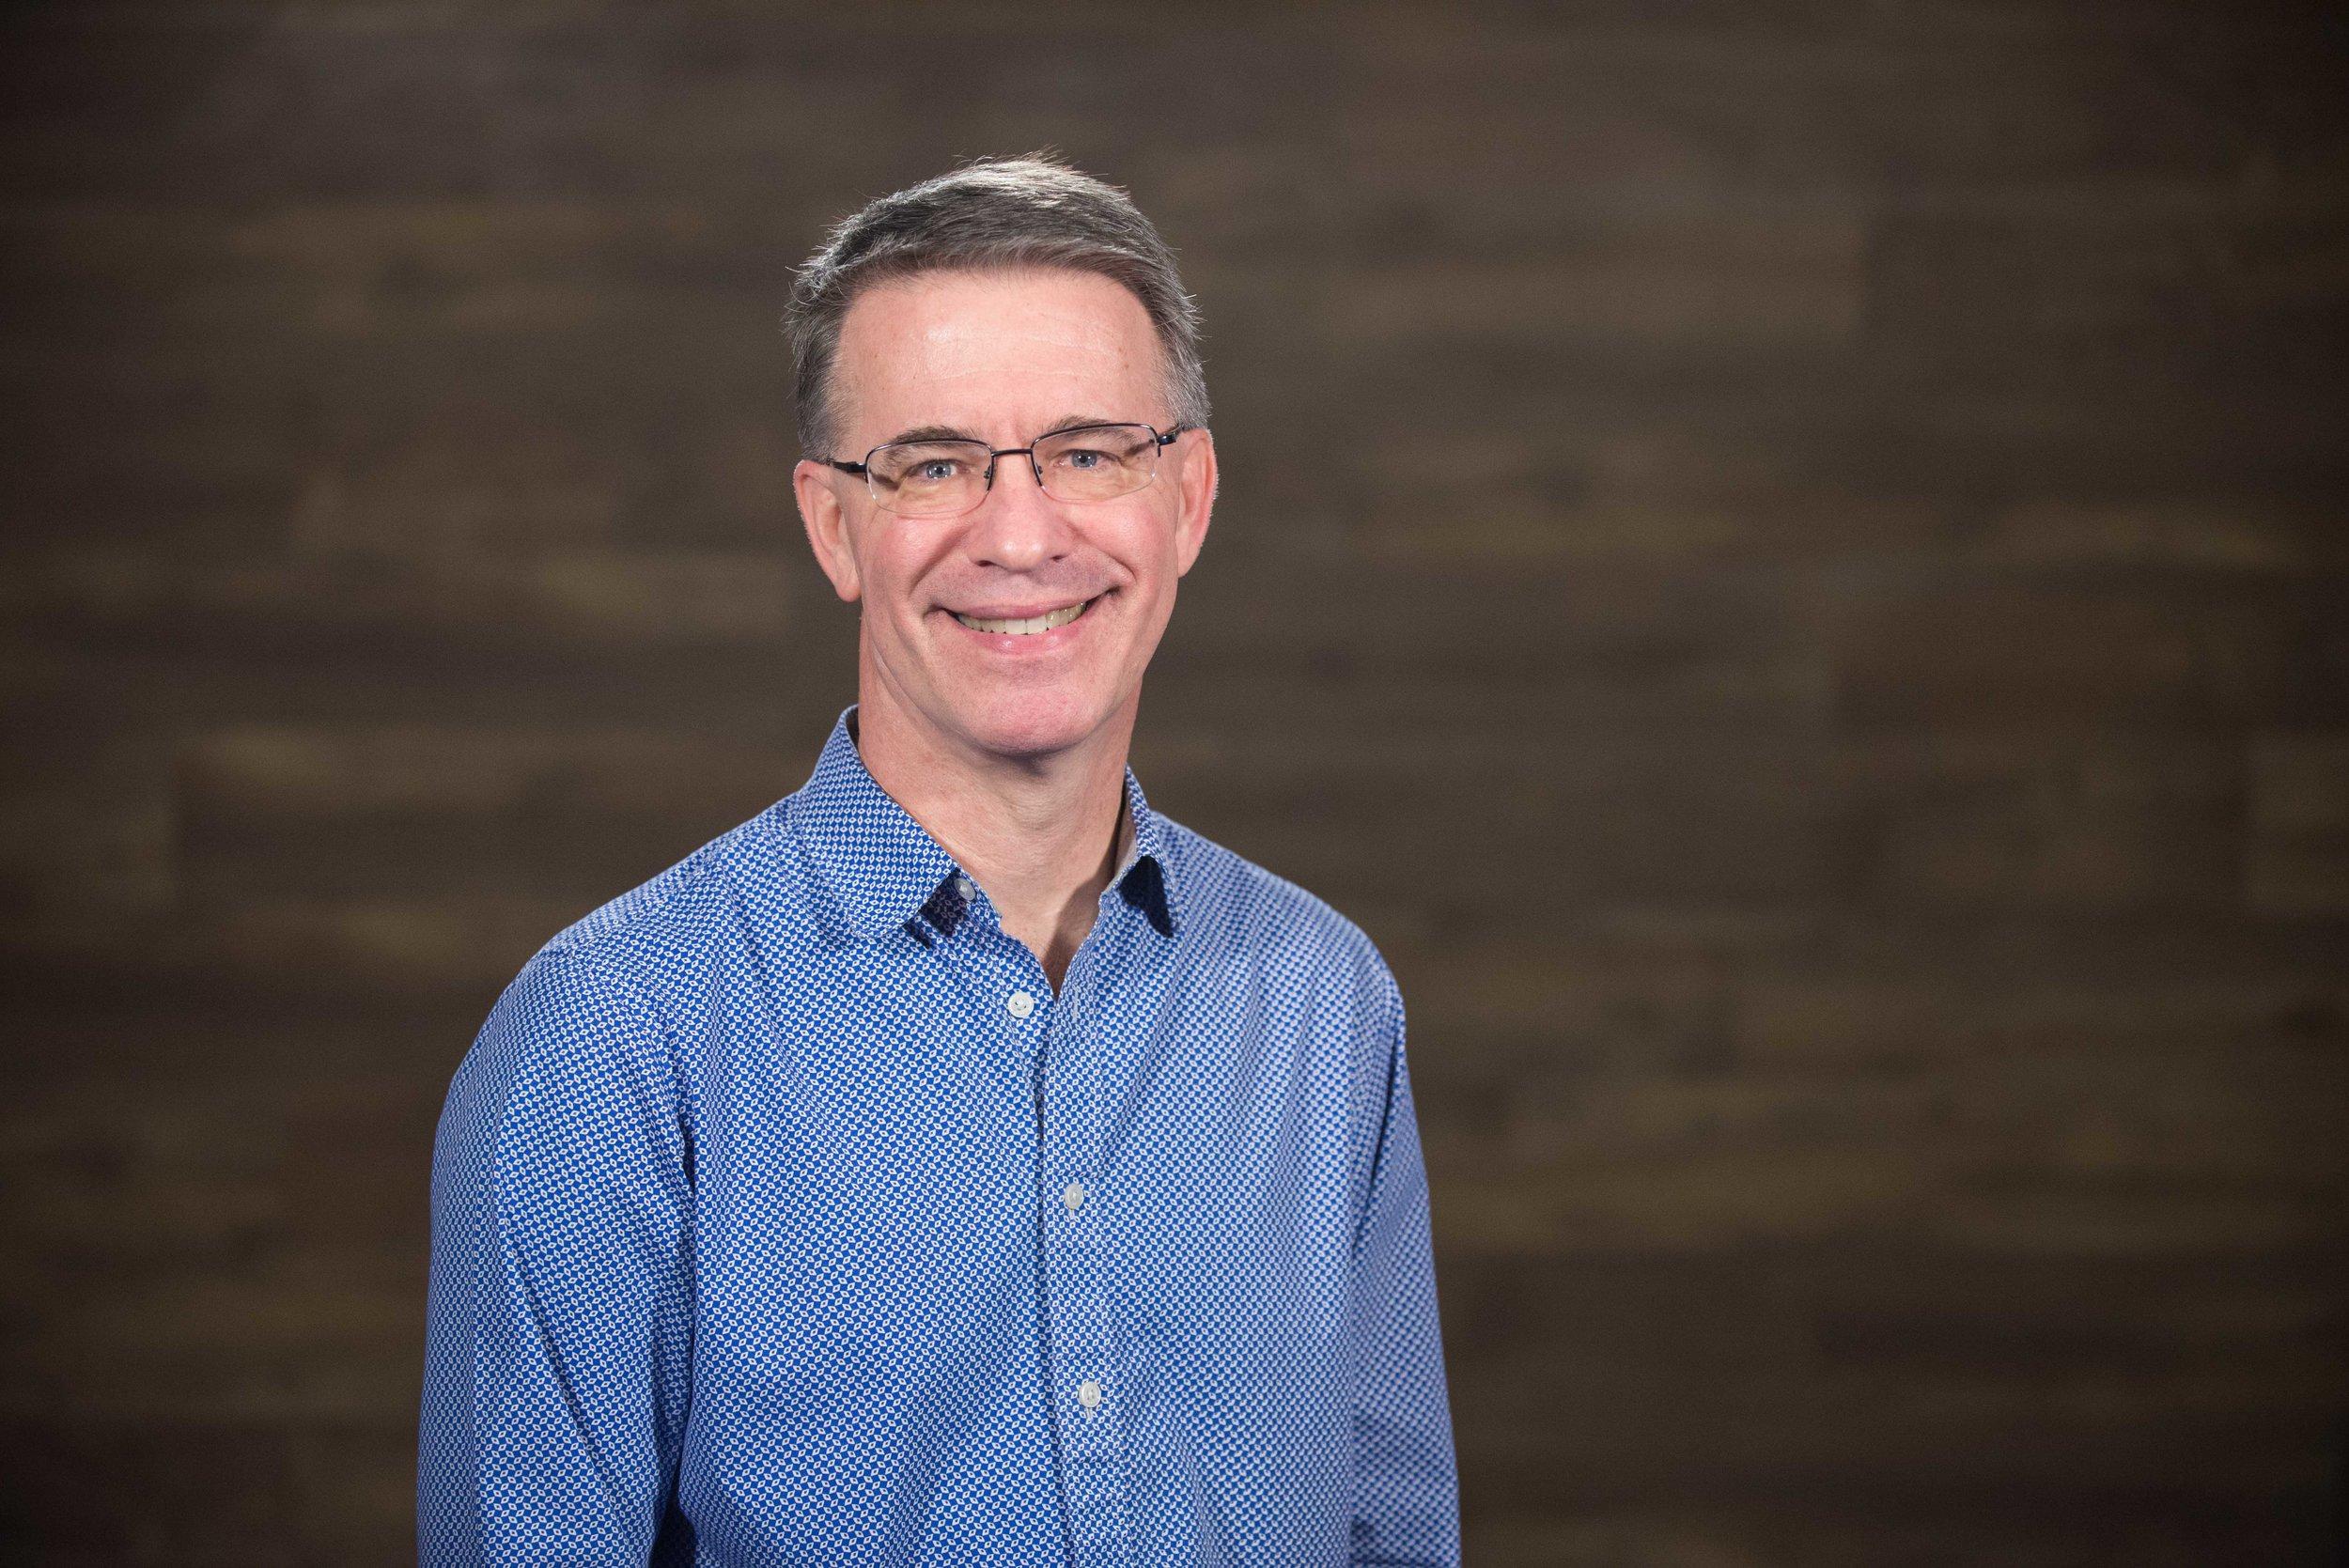 Paul Taulman, Associate Pastor of Worship and Discipleship - paul@forersthills.org919-828-6161x102